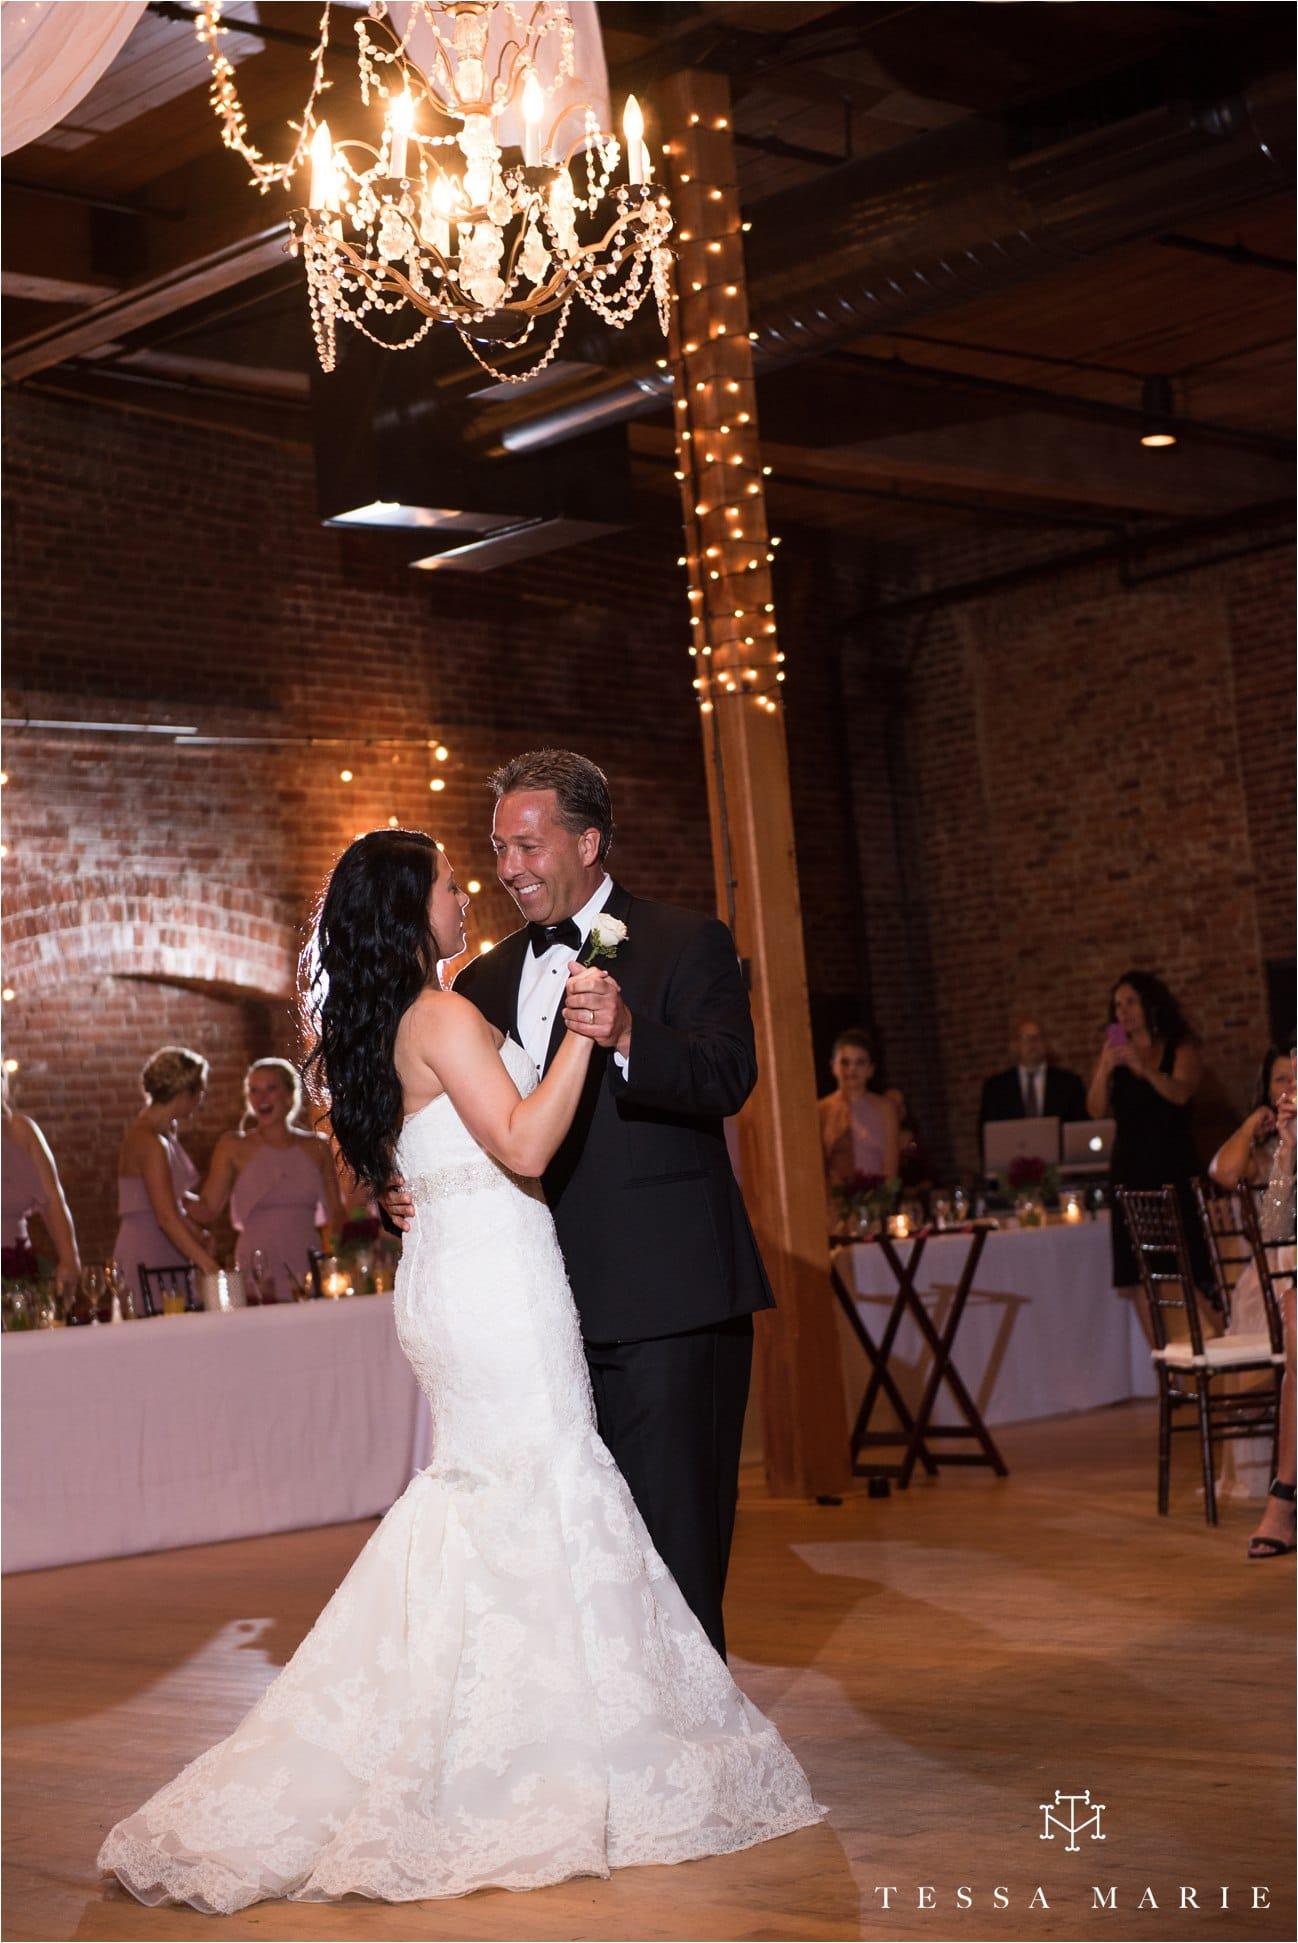 tessa_marie_weddings_rivermill_event_centere_candid_outdoor_wedding_photos_0332